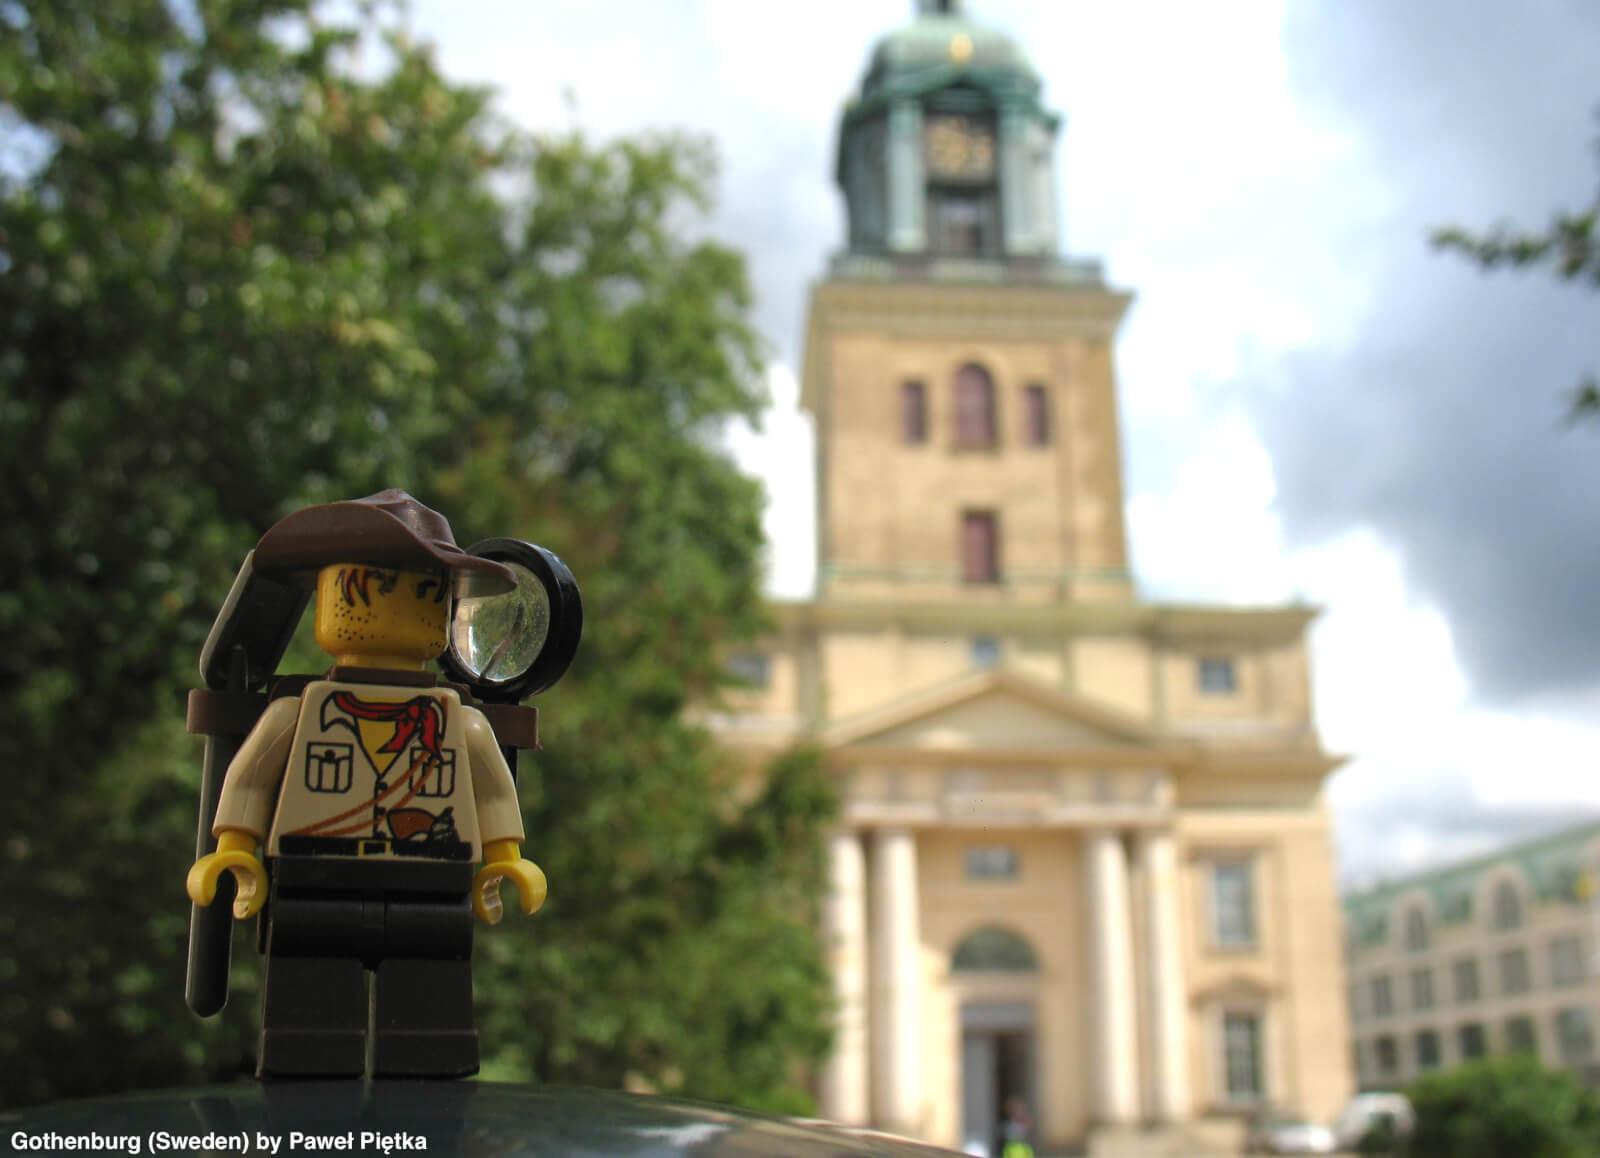 Gothenburg (Sweden) - Cathedral